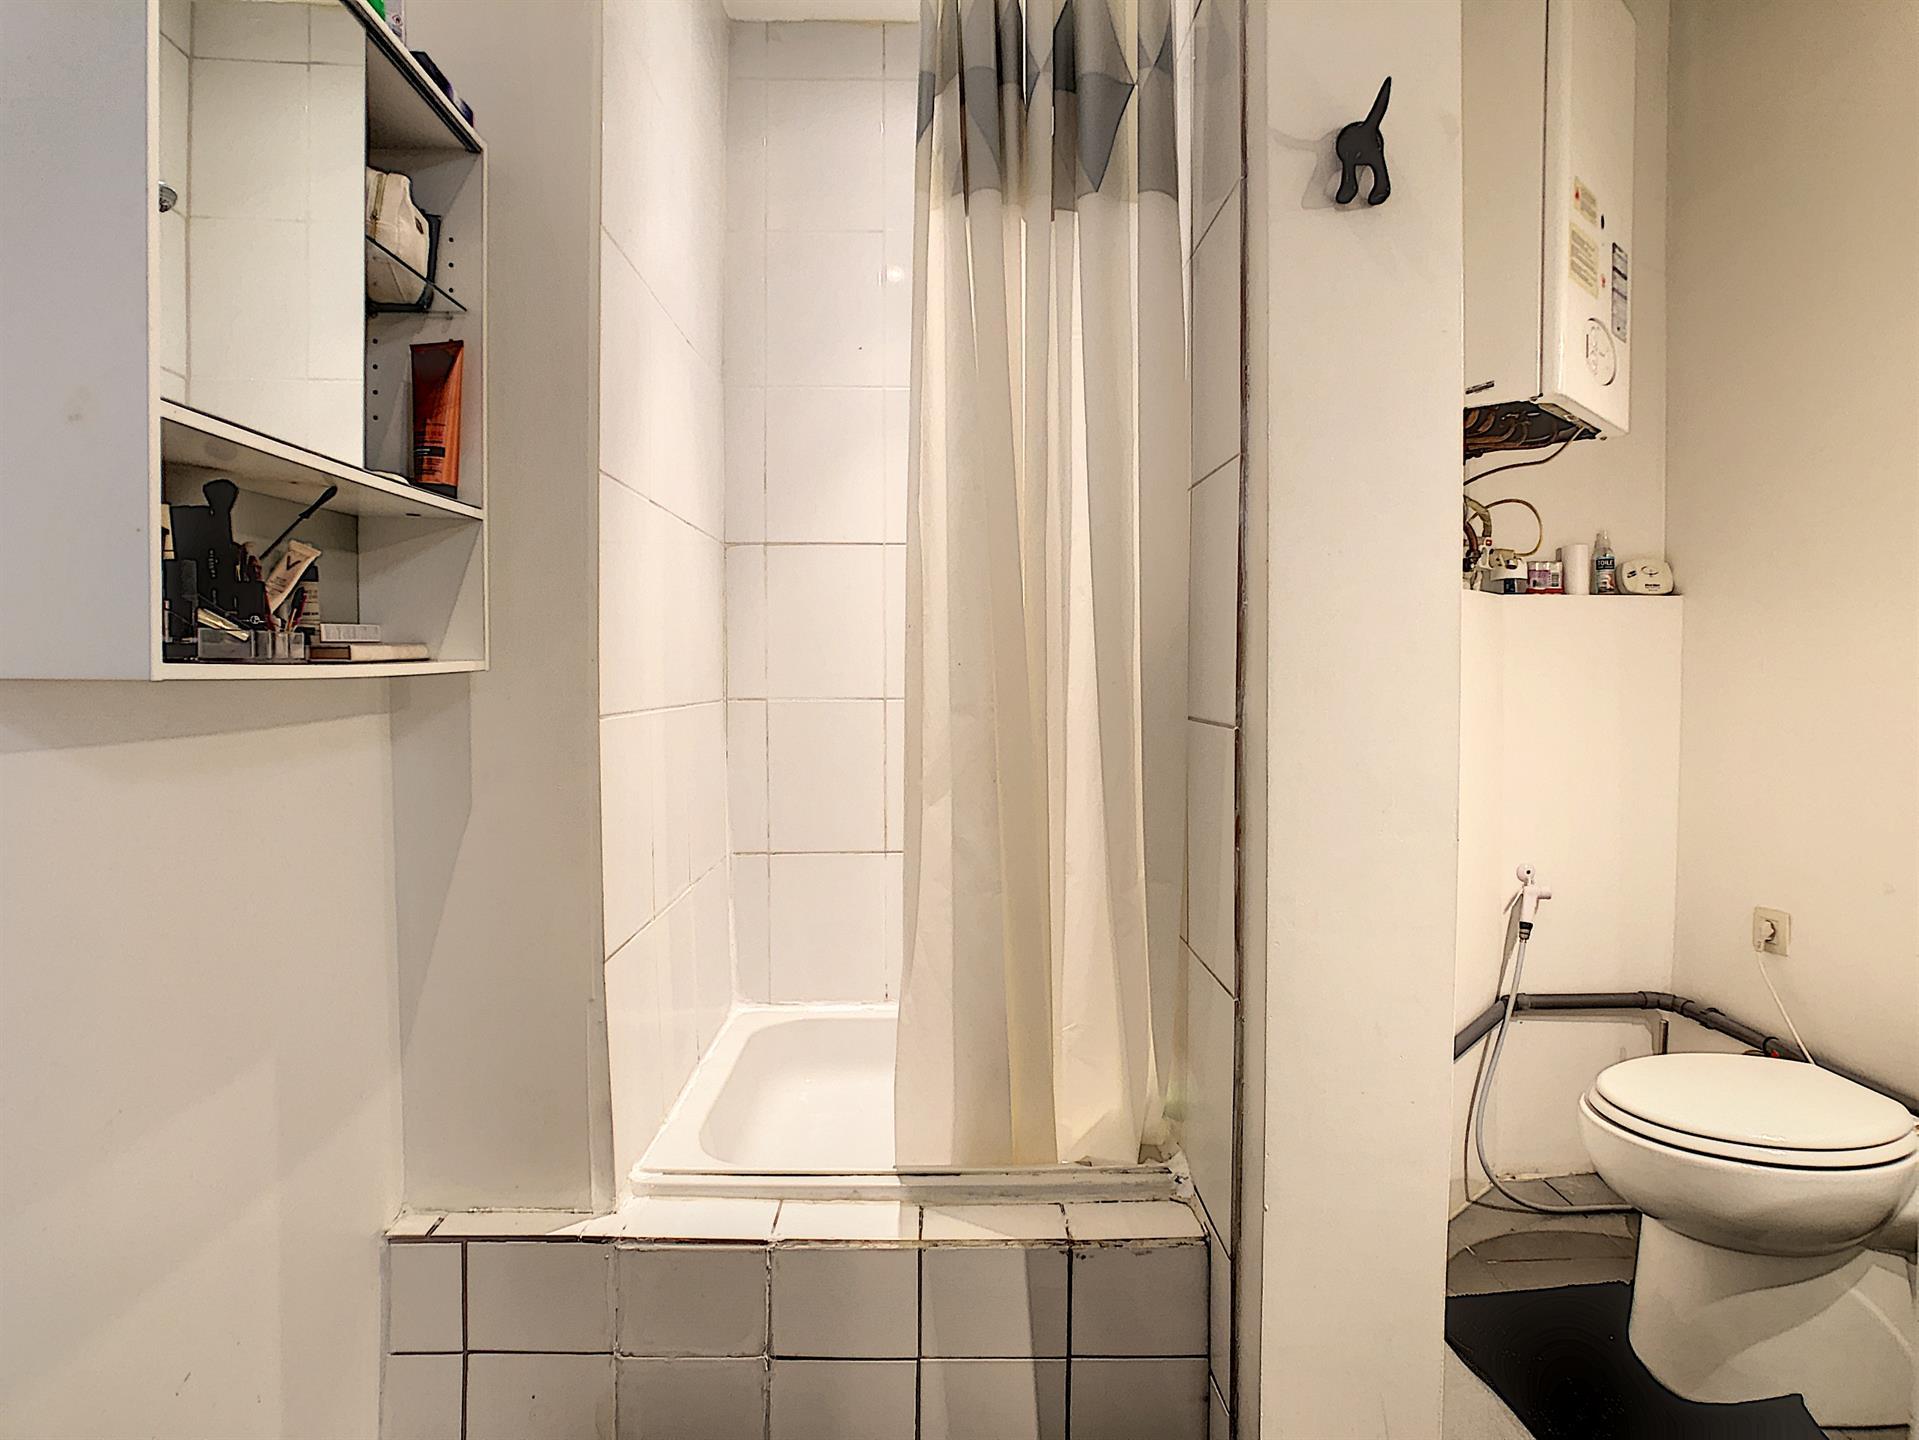 Appartement - Molenbeek-Saint-Jean - #4283157-4